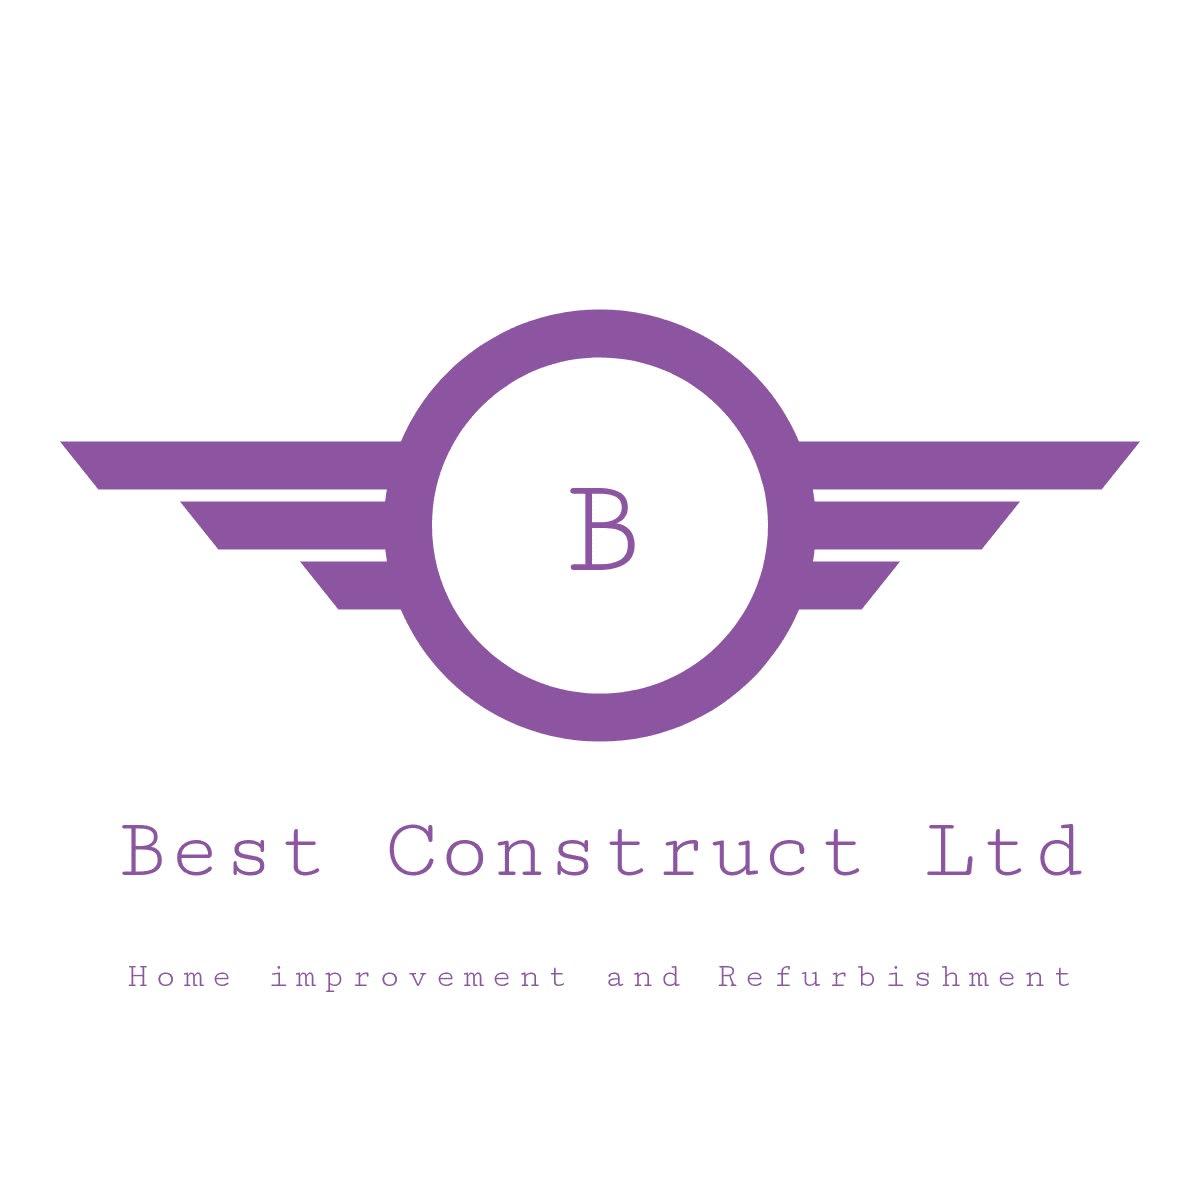 Best Construct